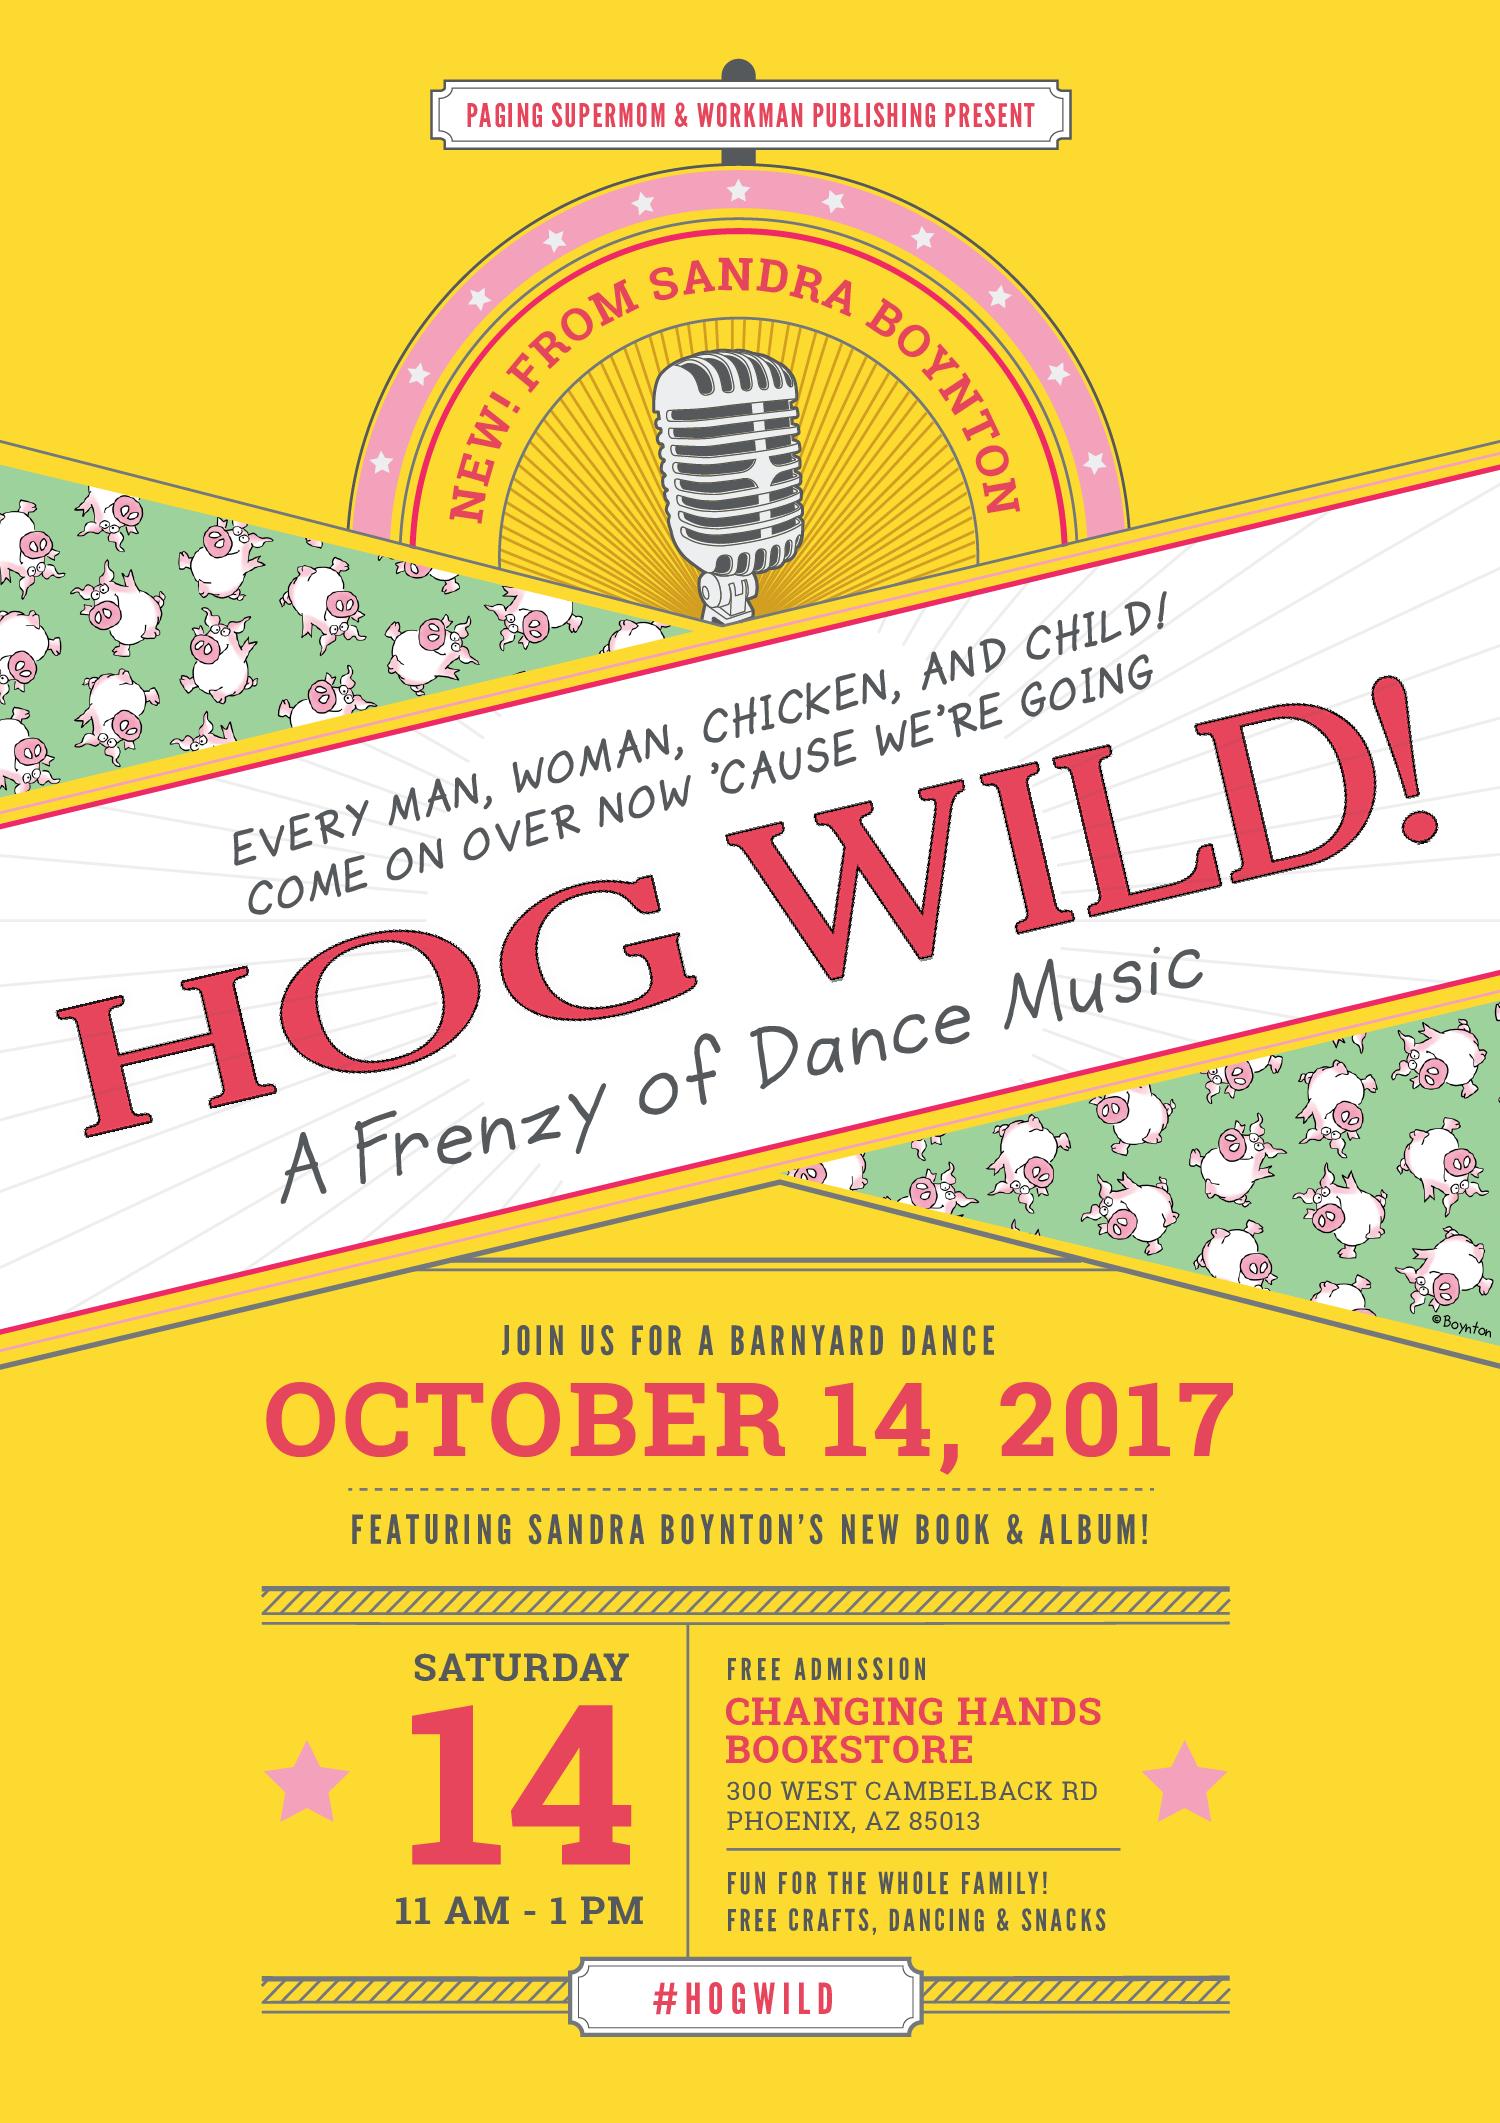 Hog Wild Sandra Boynton's new book - Launch Party in Phoenix